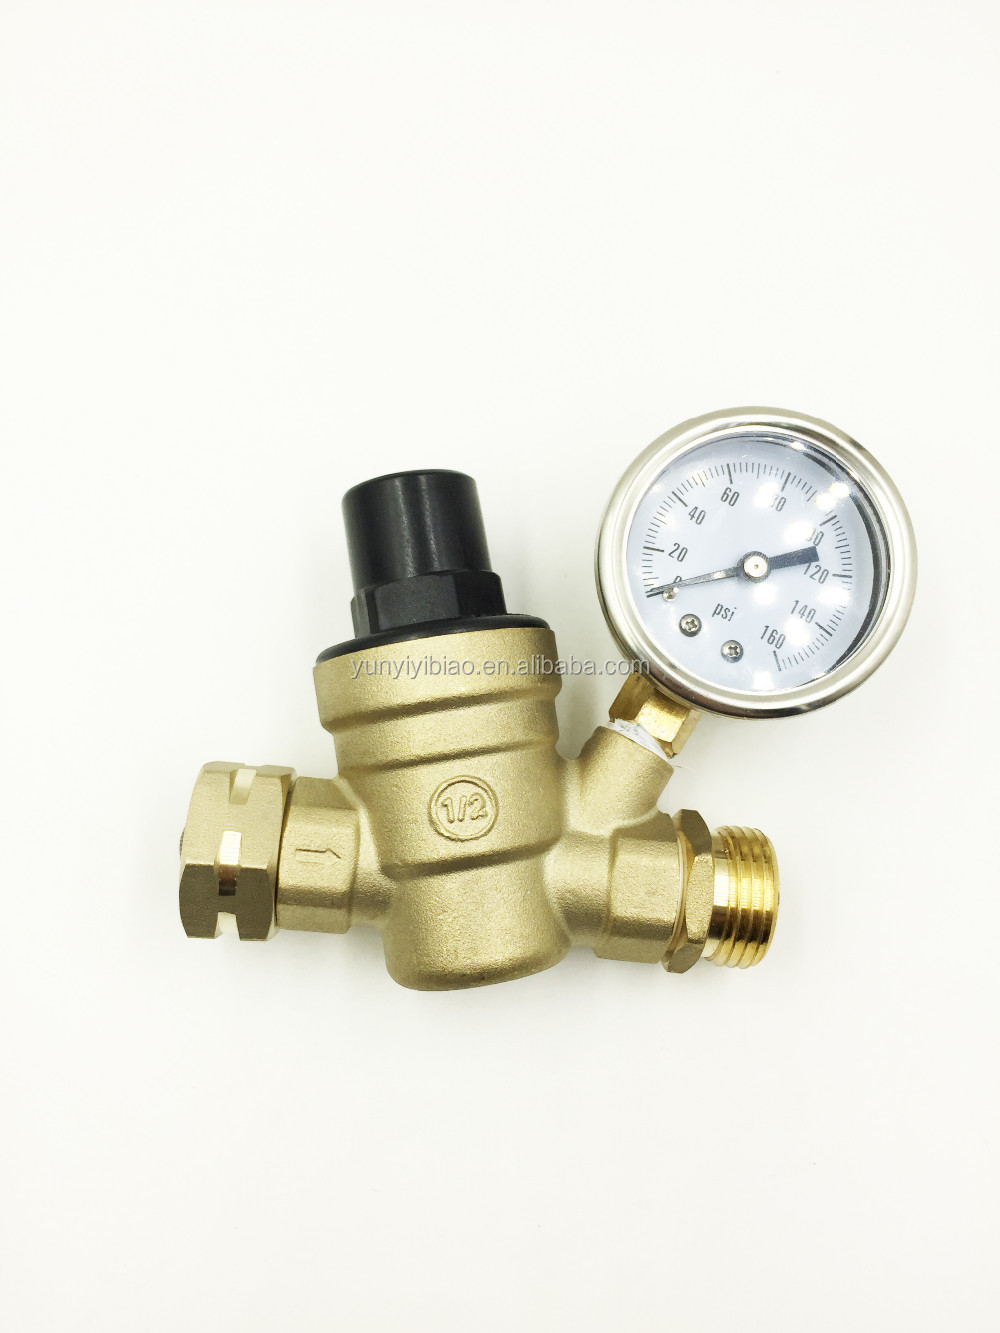 Brass Water Pressure Regulator